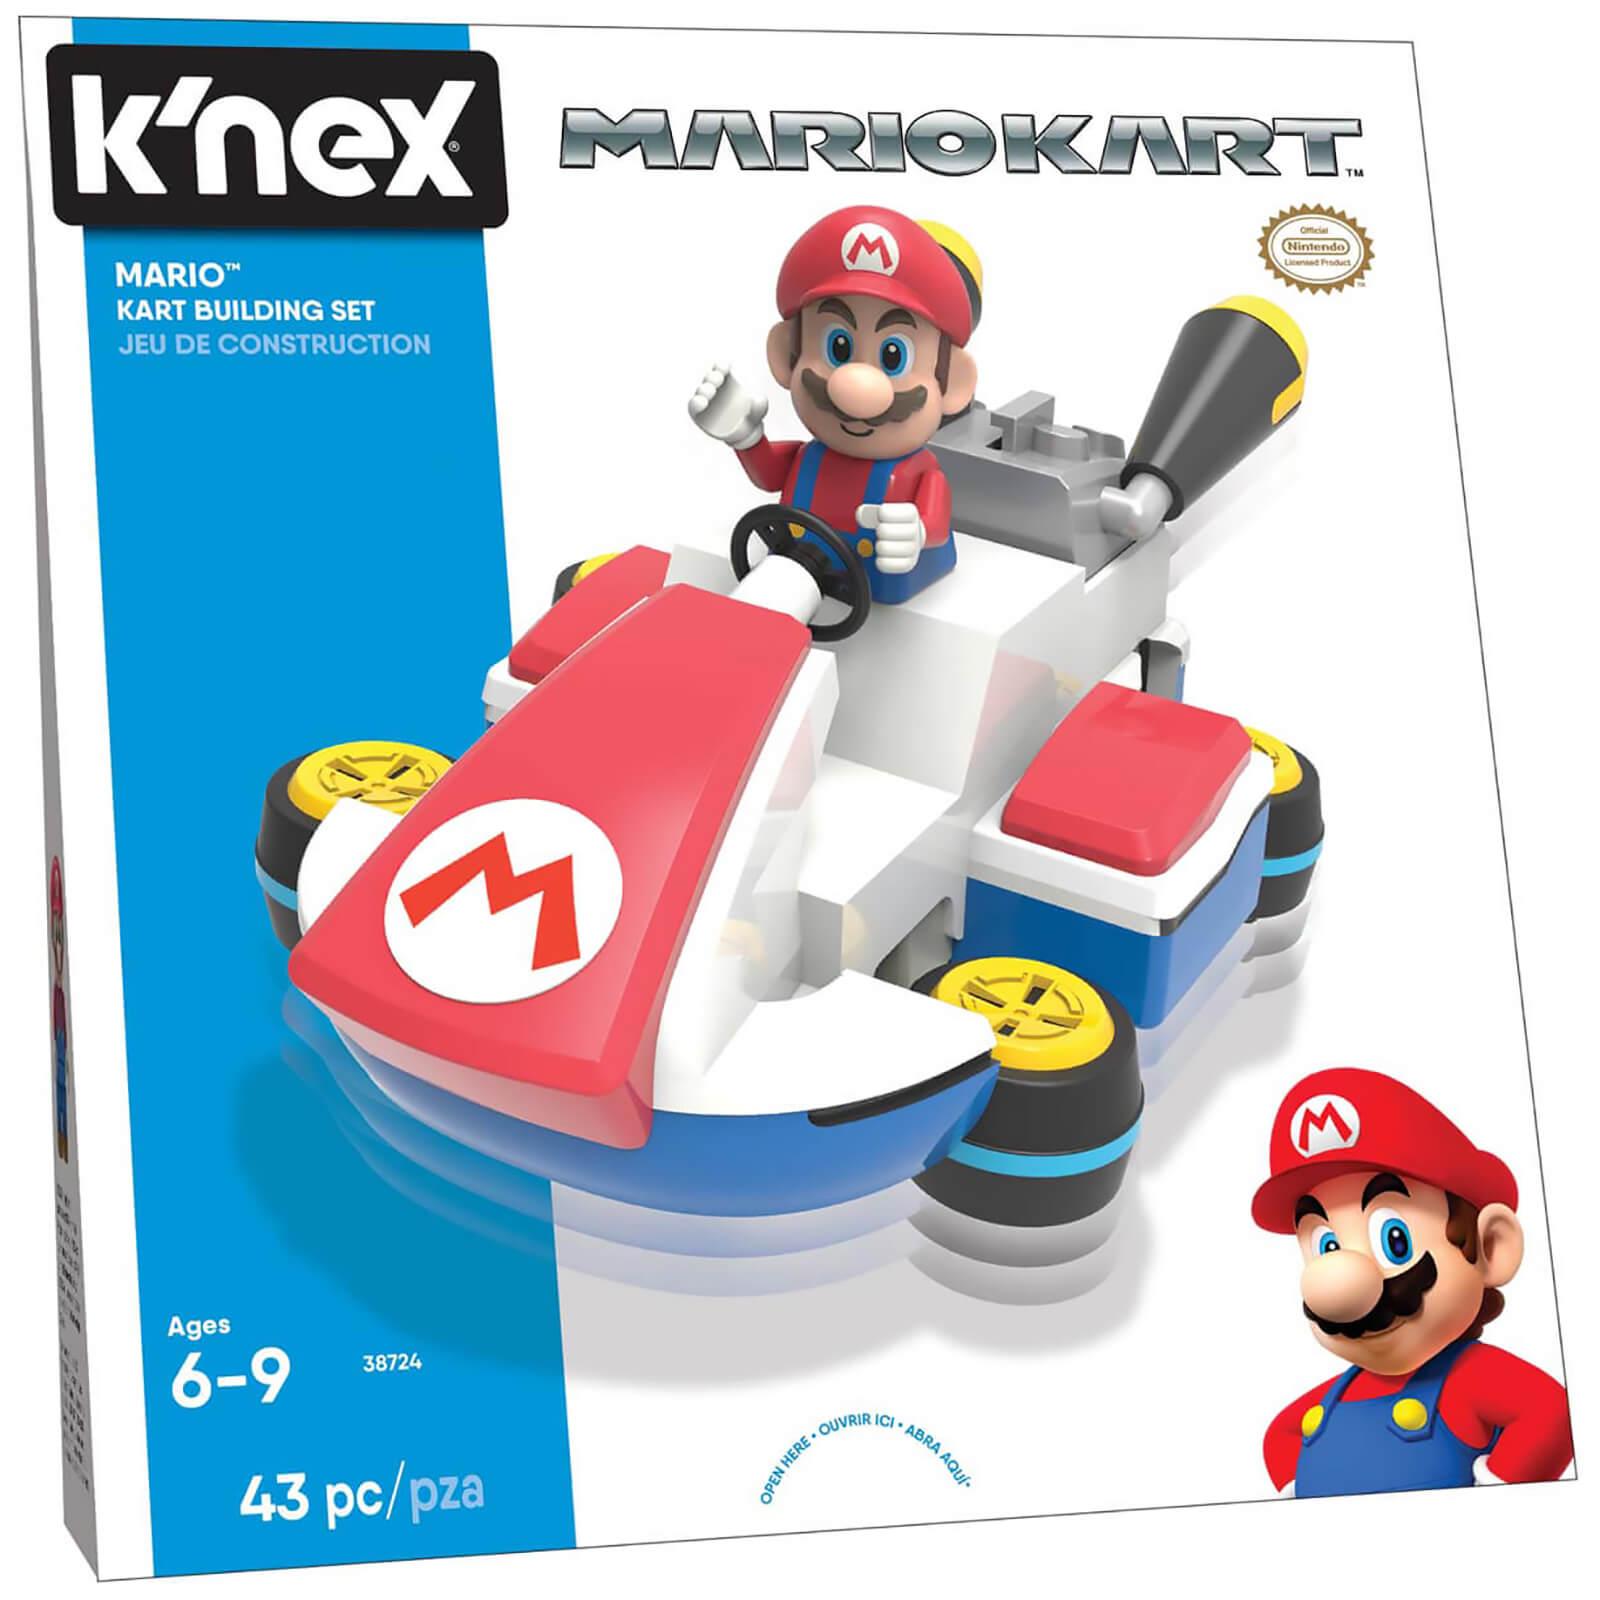 K'NEX Mario Kart: Mario Kart Building Set (38724) Toys ...